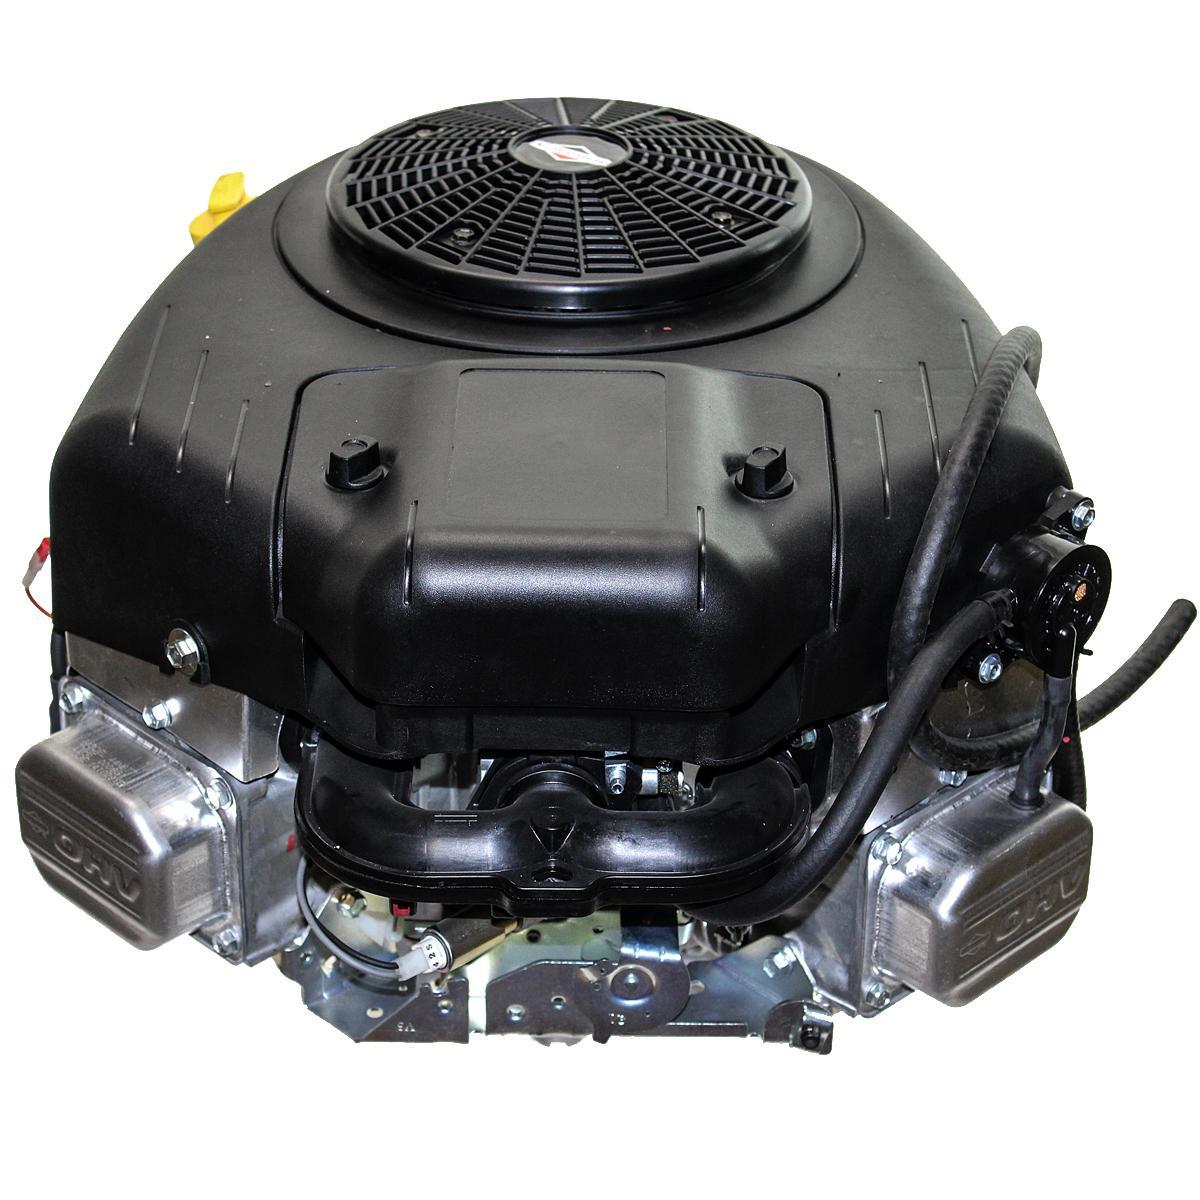 Repower Scag Tiger Cub Kawasaki Fh680v Wiring Diagram 44n677 Tigercub